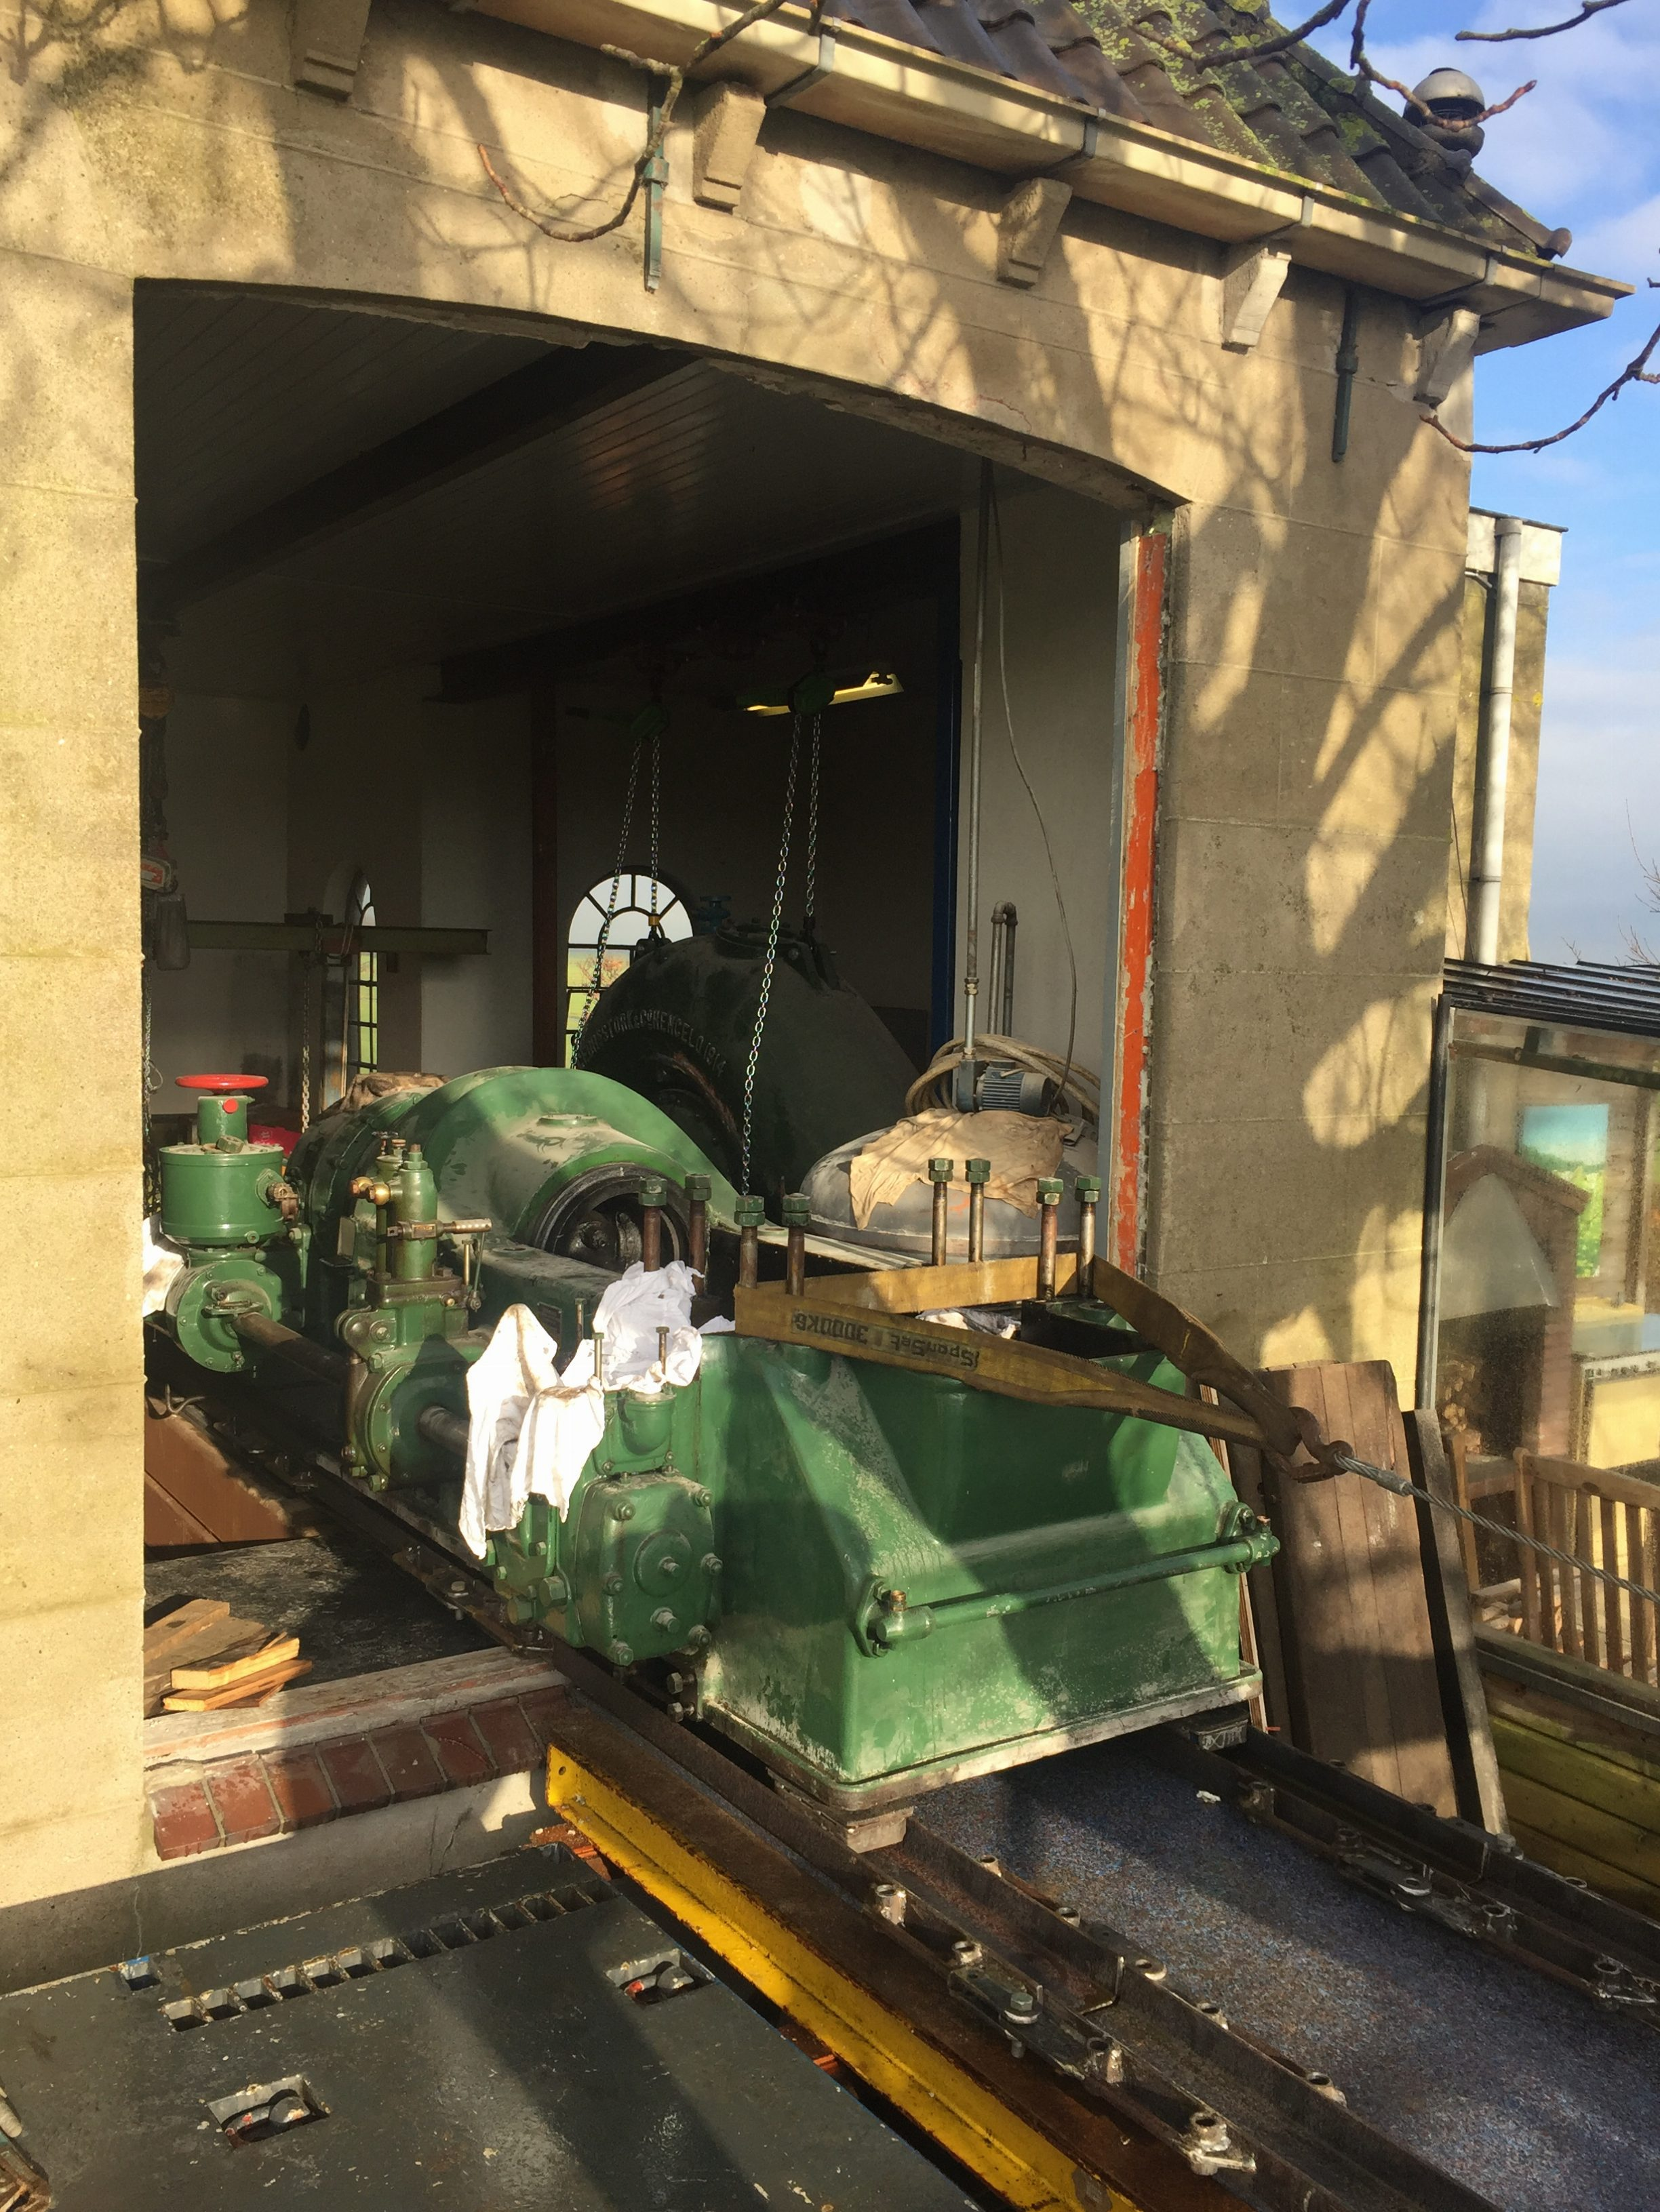 verhuizing oude diesel motor e1500035725400